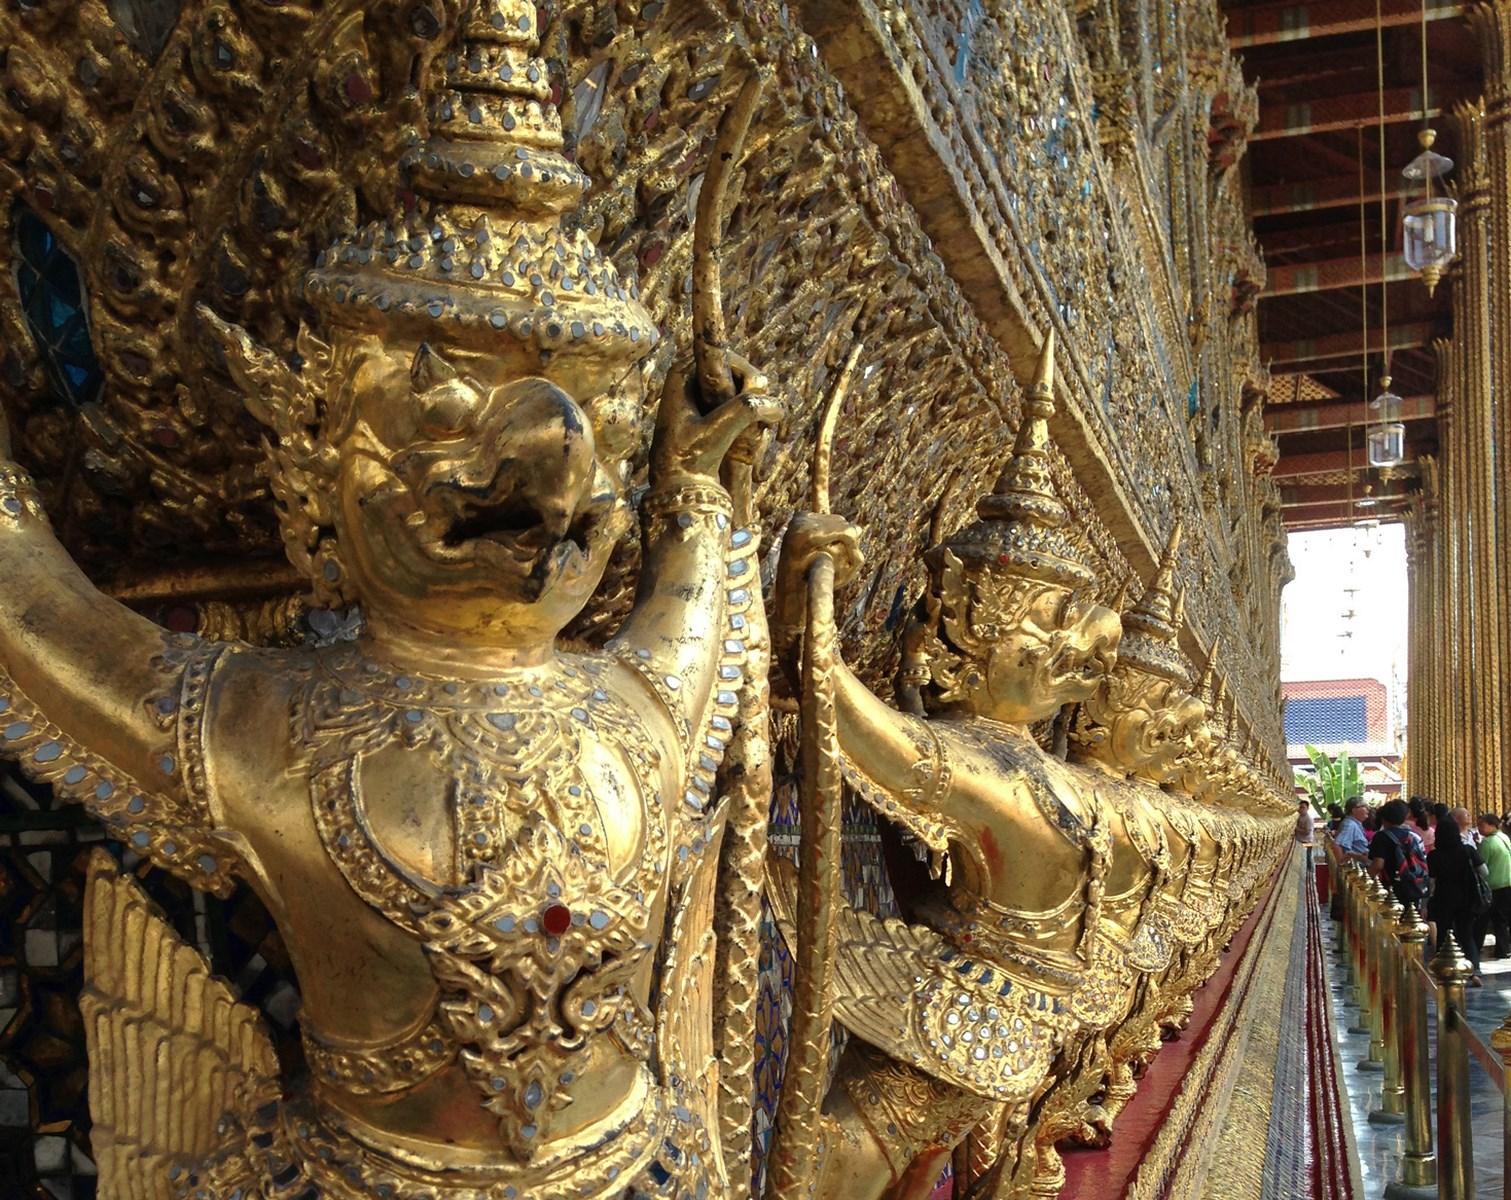 Thaïlande 2/2 : mars 2013